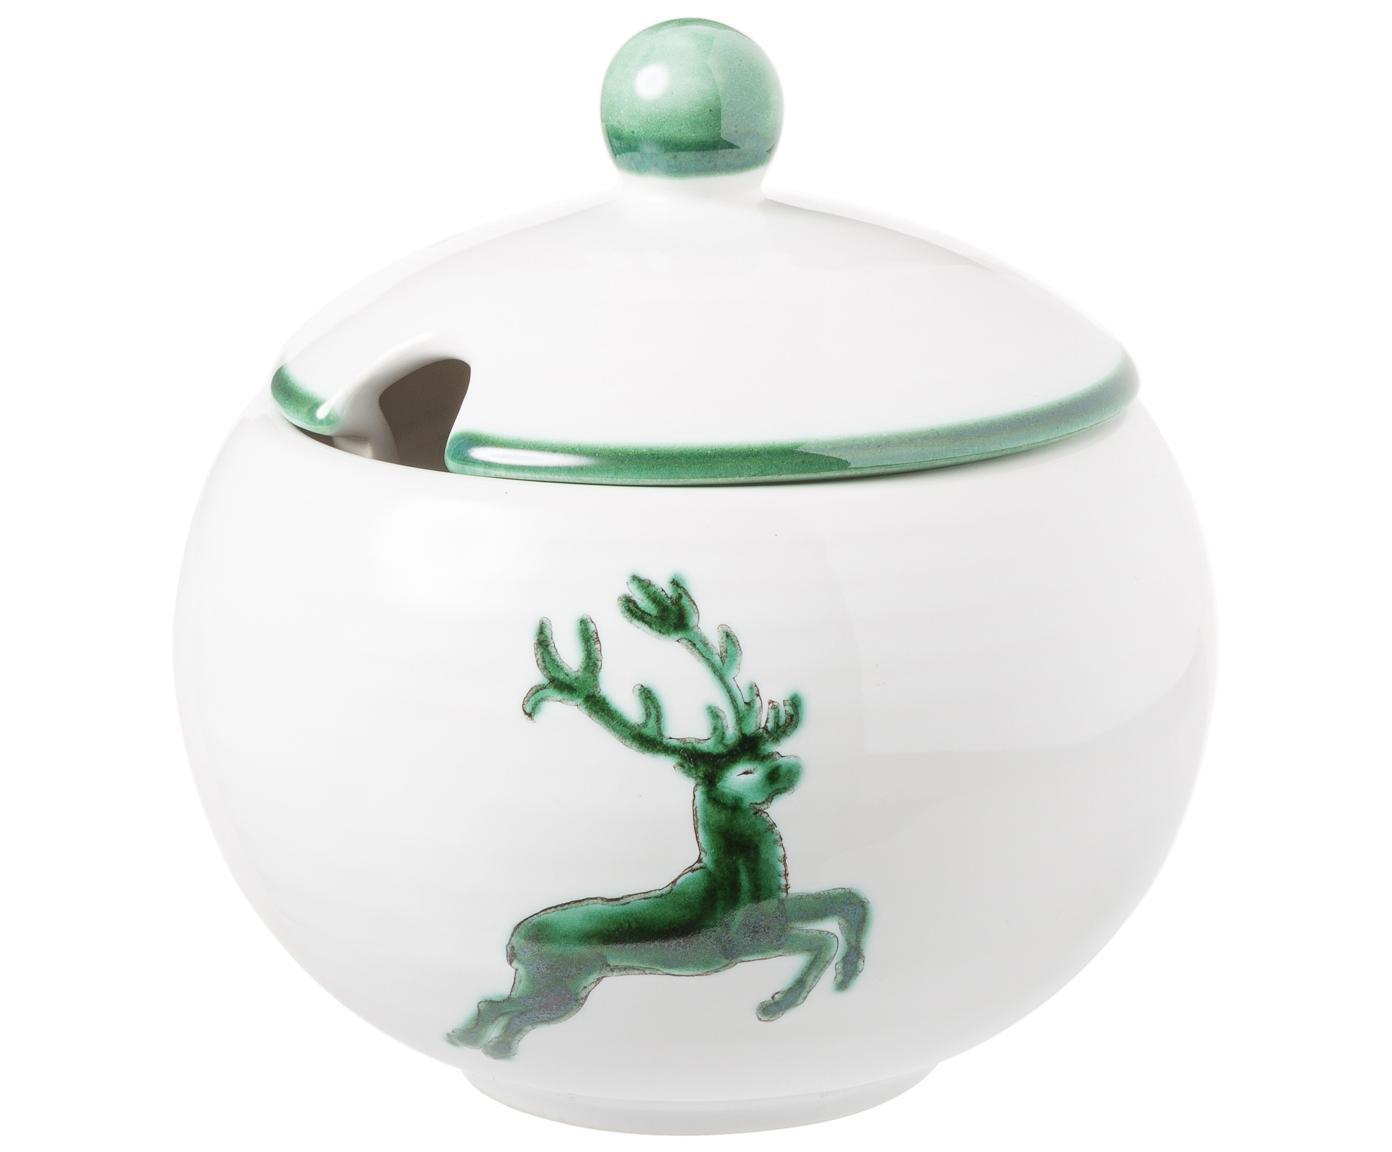 Suikerpot Classic Groene Hert, Keramiek, Wit, Ø 10 cm